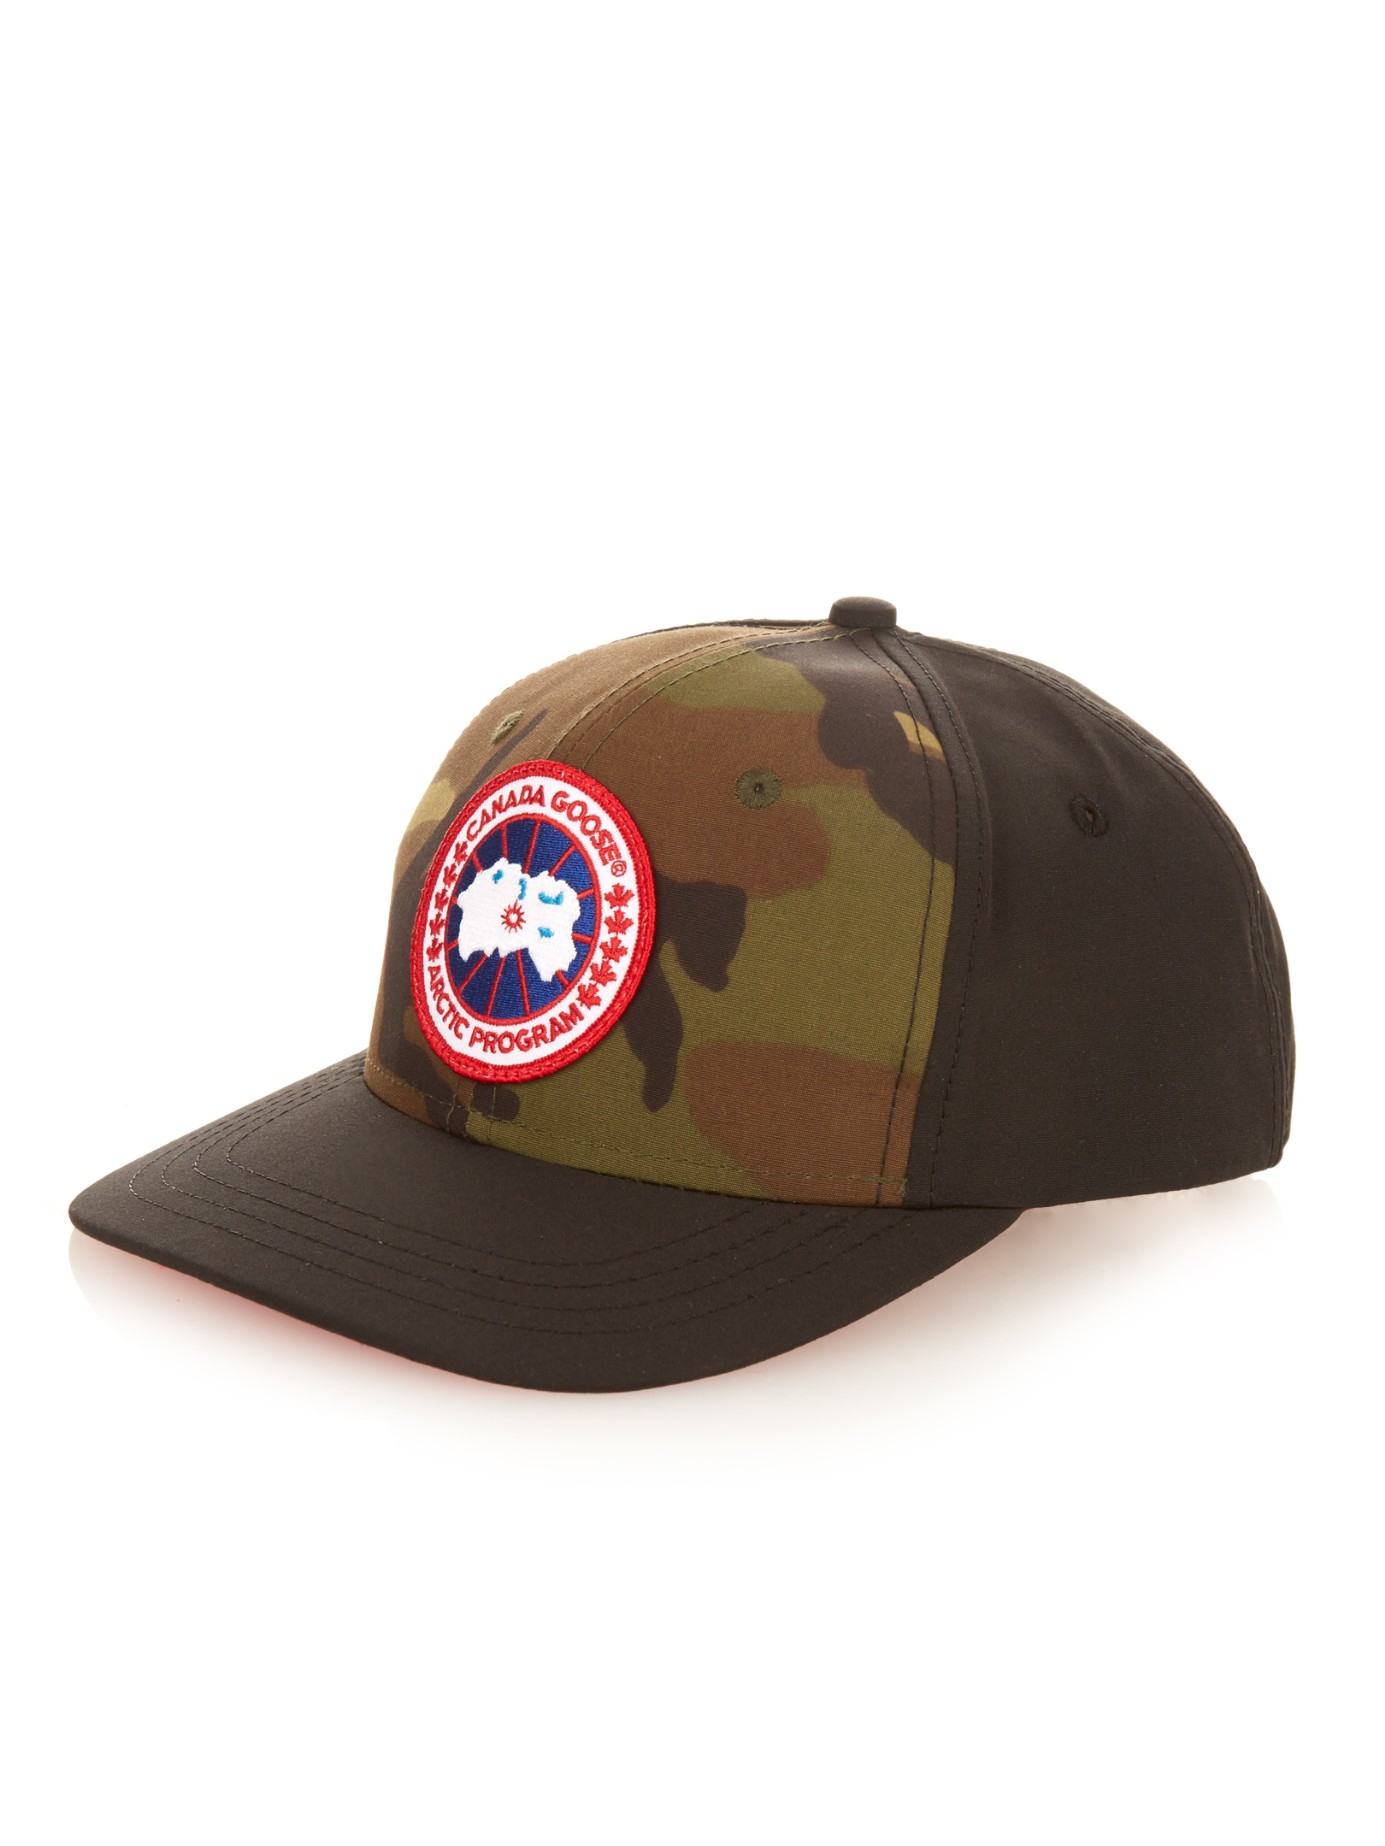 Canada Goose' hats sale shop